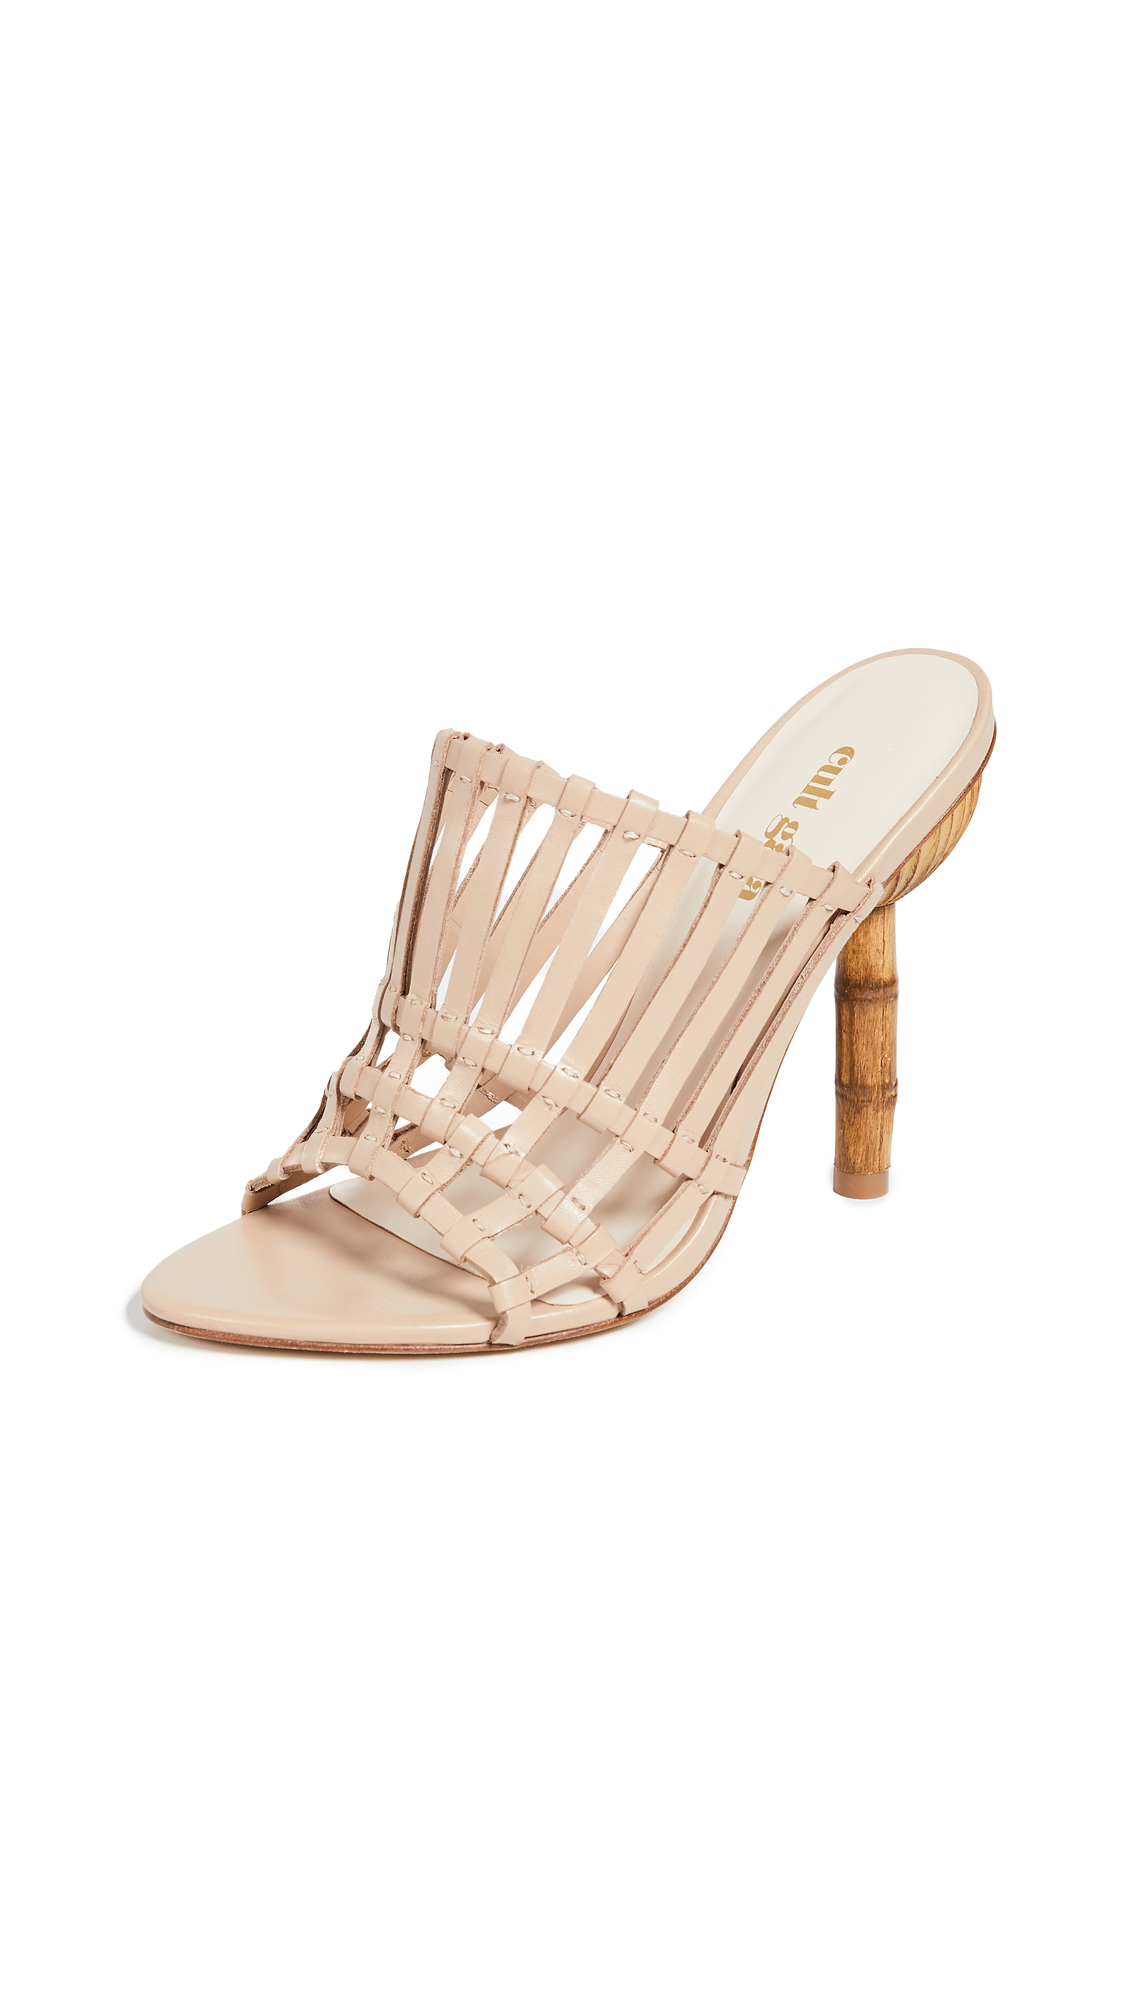 Buy Cult Gaia Ark Heel Slide Sandals online, shop Cult Gaia